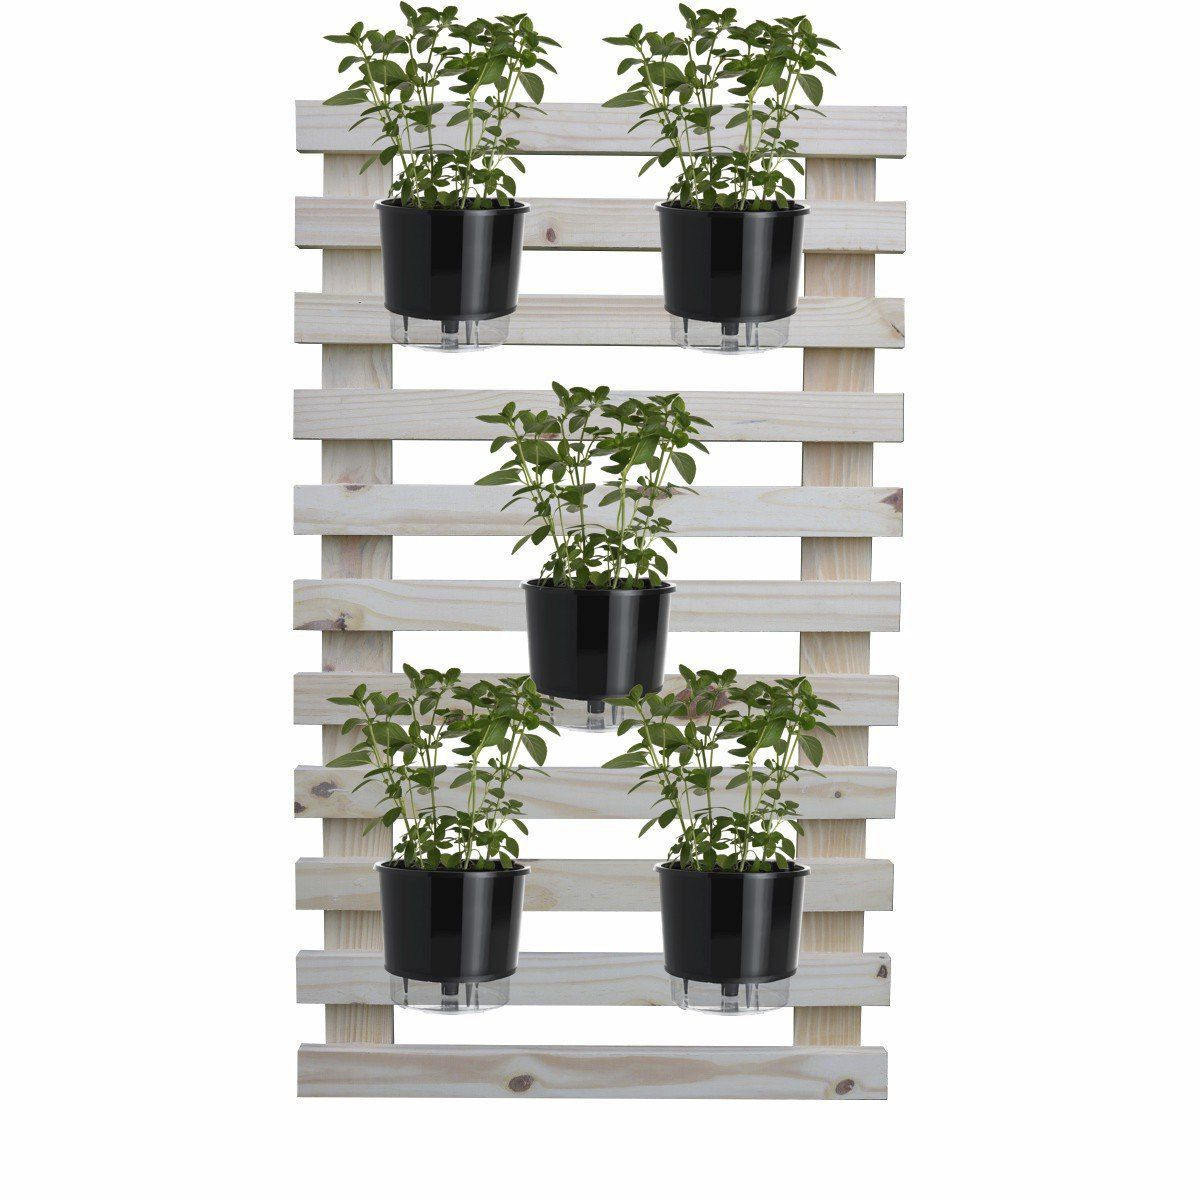 Kit Horta Vertical 100cm x 60cm + 5 Vasos + 5 Argilas + 5 Substratos + 5 Suportes